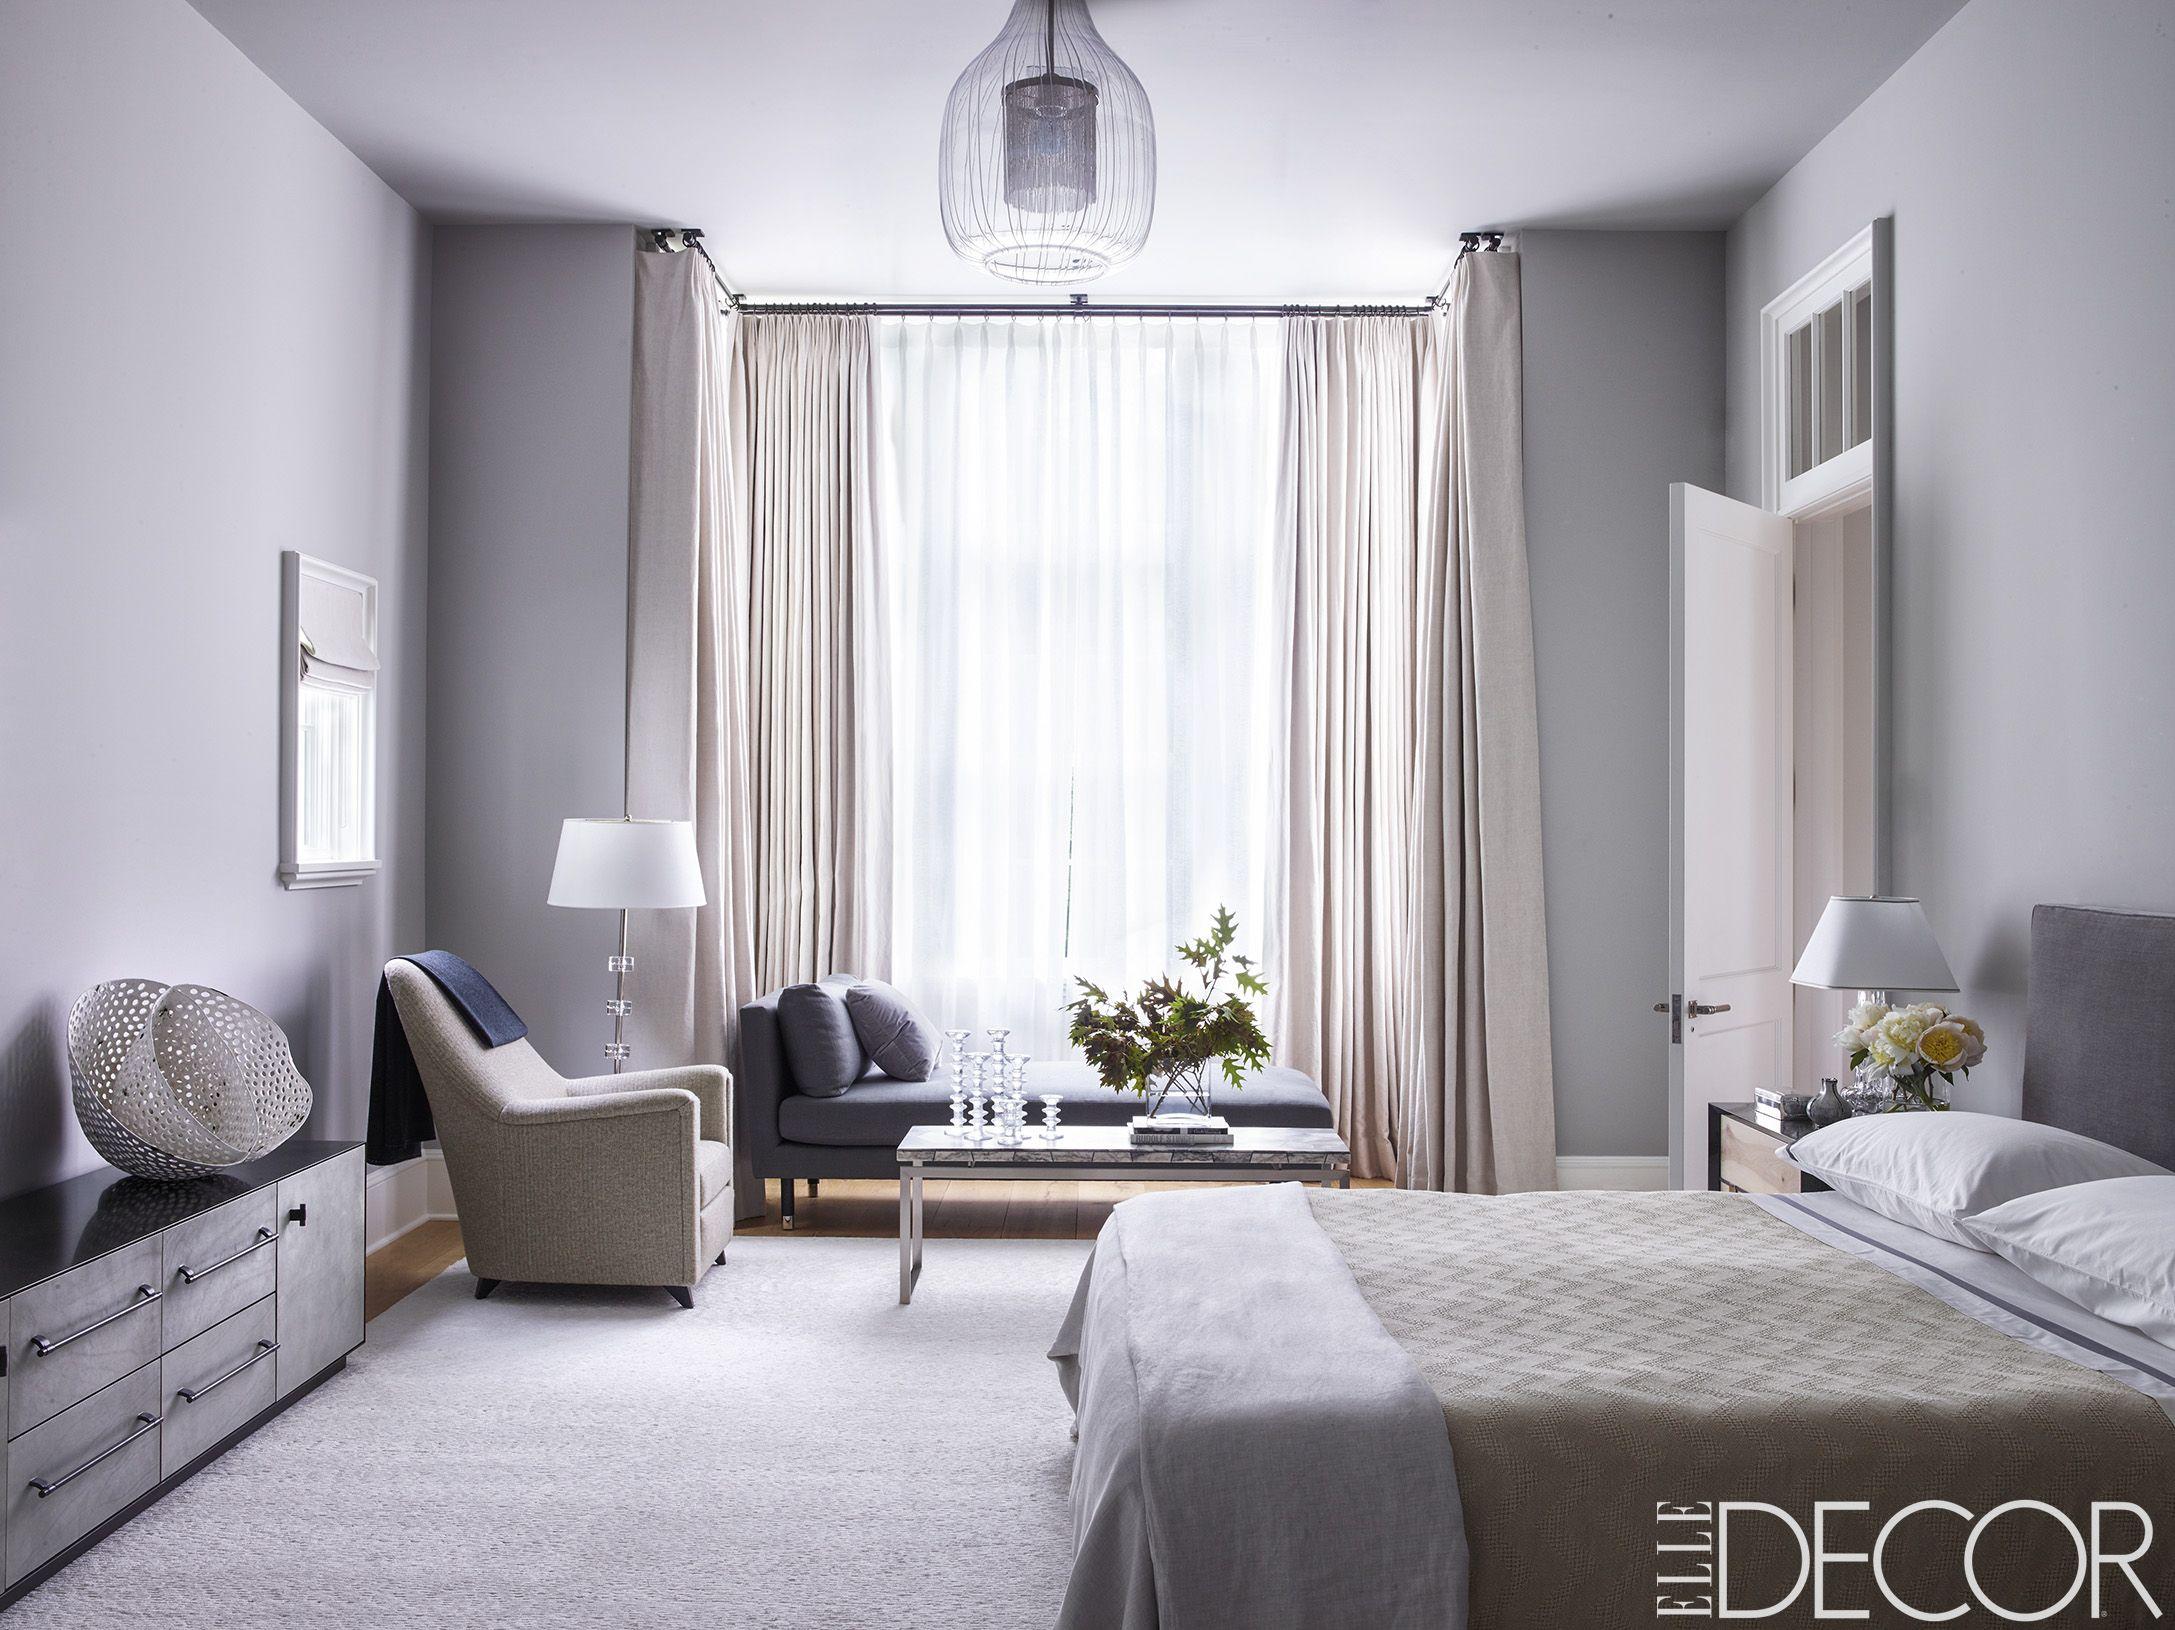 25 Minimalist Bedroom Decor Ideas - Modern Designs for ... on Minimalist Bedroom Design Ideas  id=66224